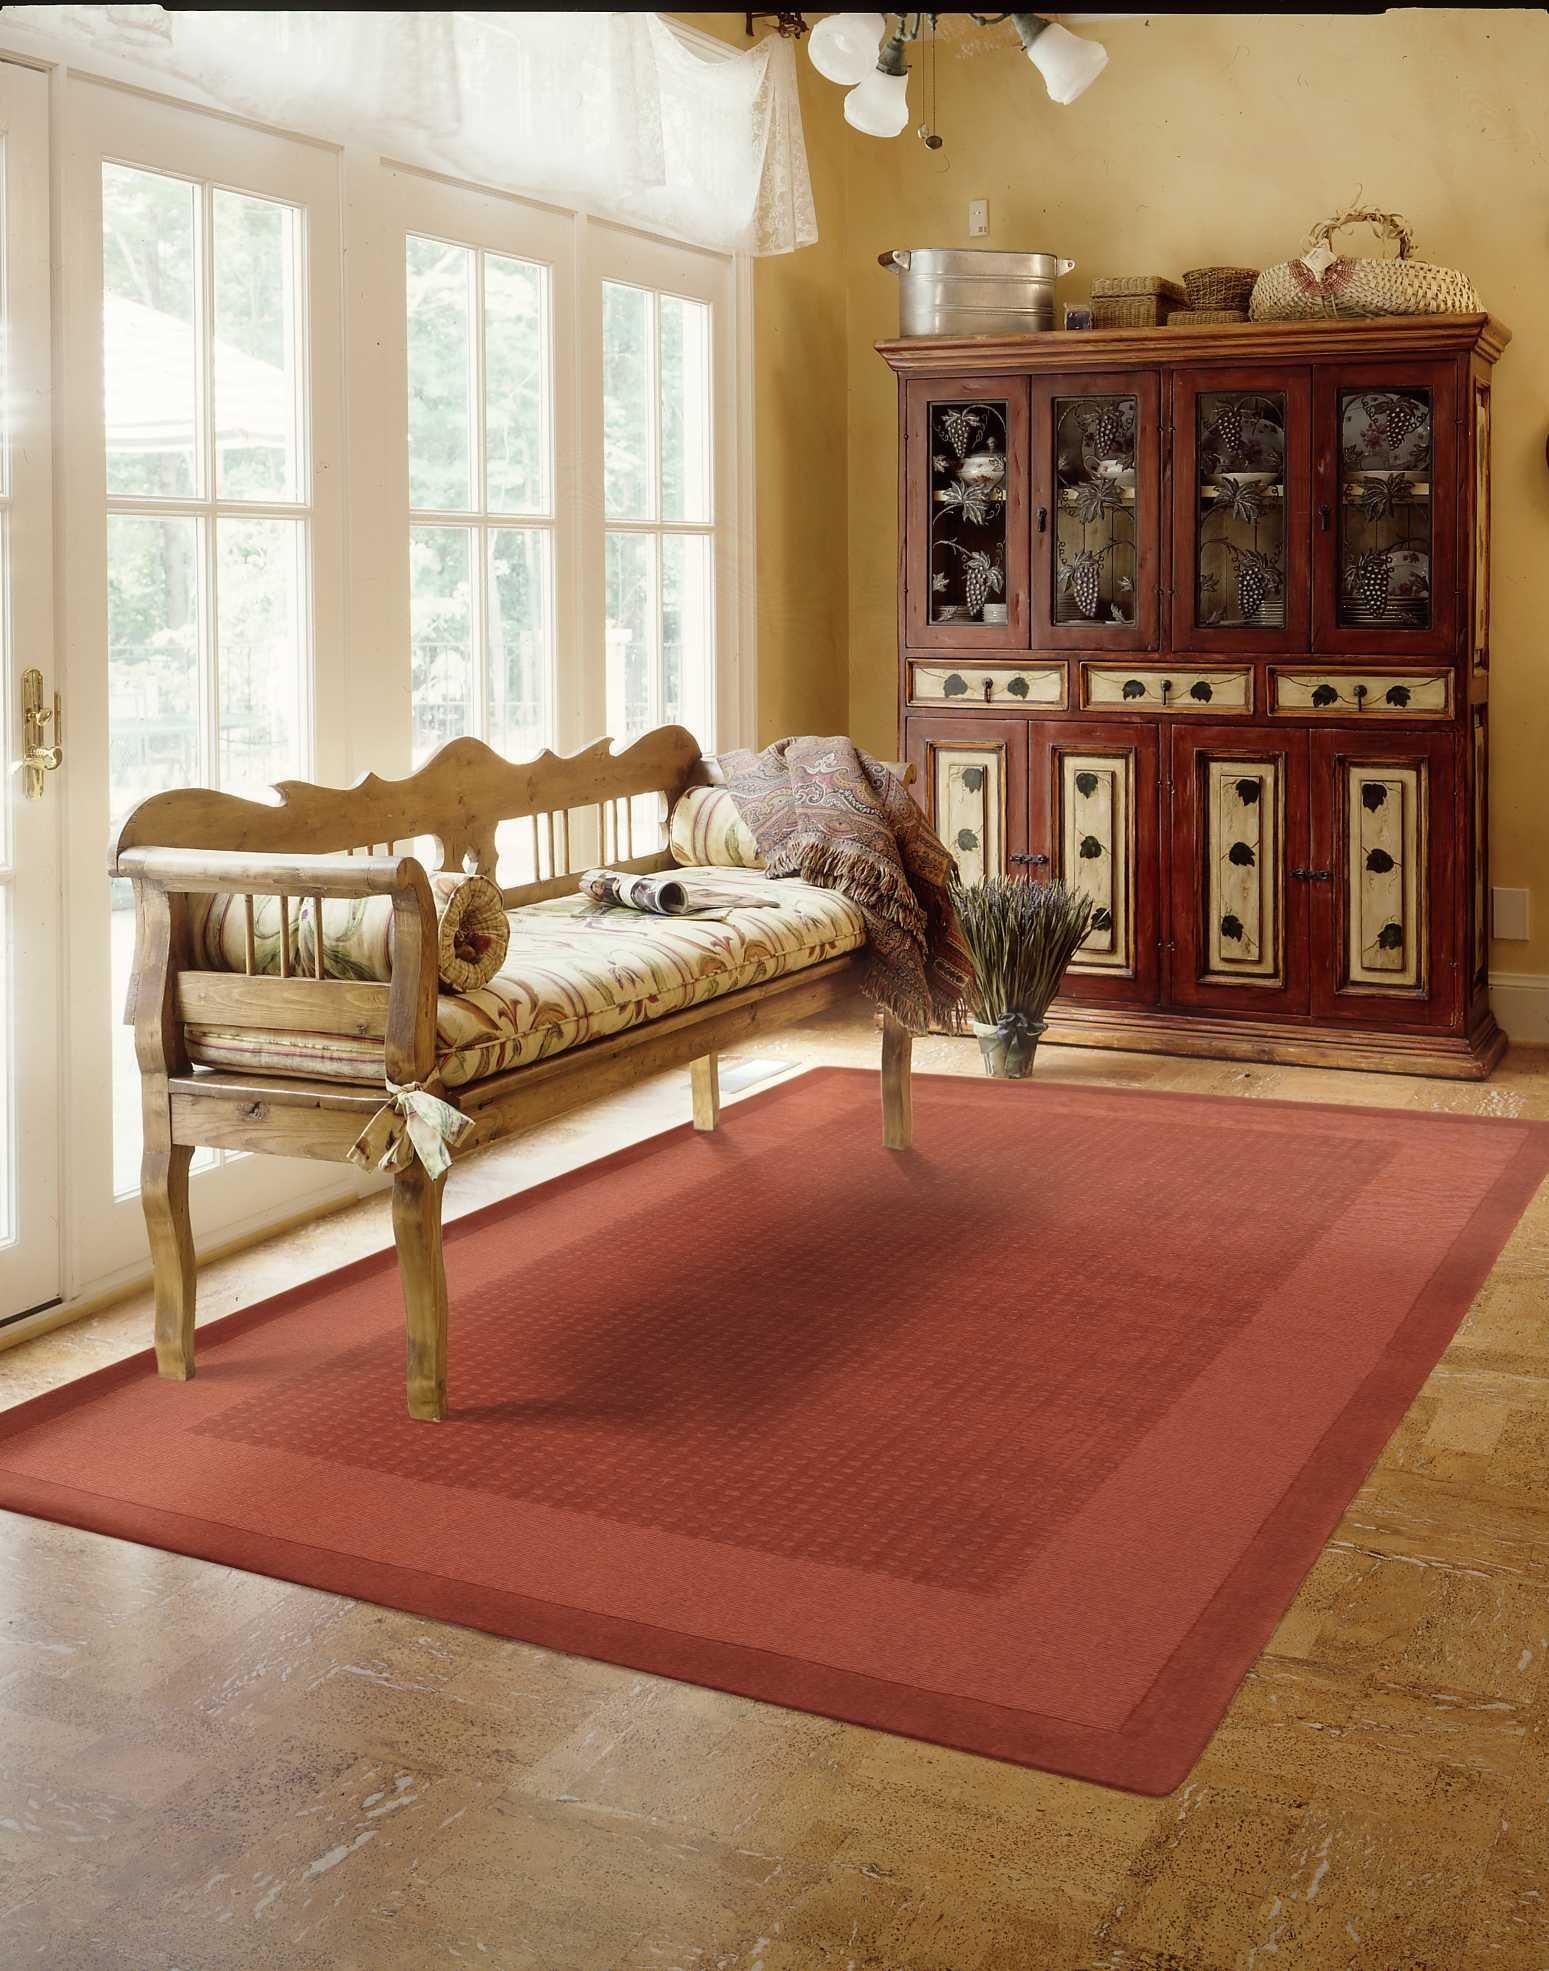 Nourison Westport (WP20) Spice Rectangle Area Rug, 5-Feet by 8-Feet  (5' x 8')